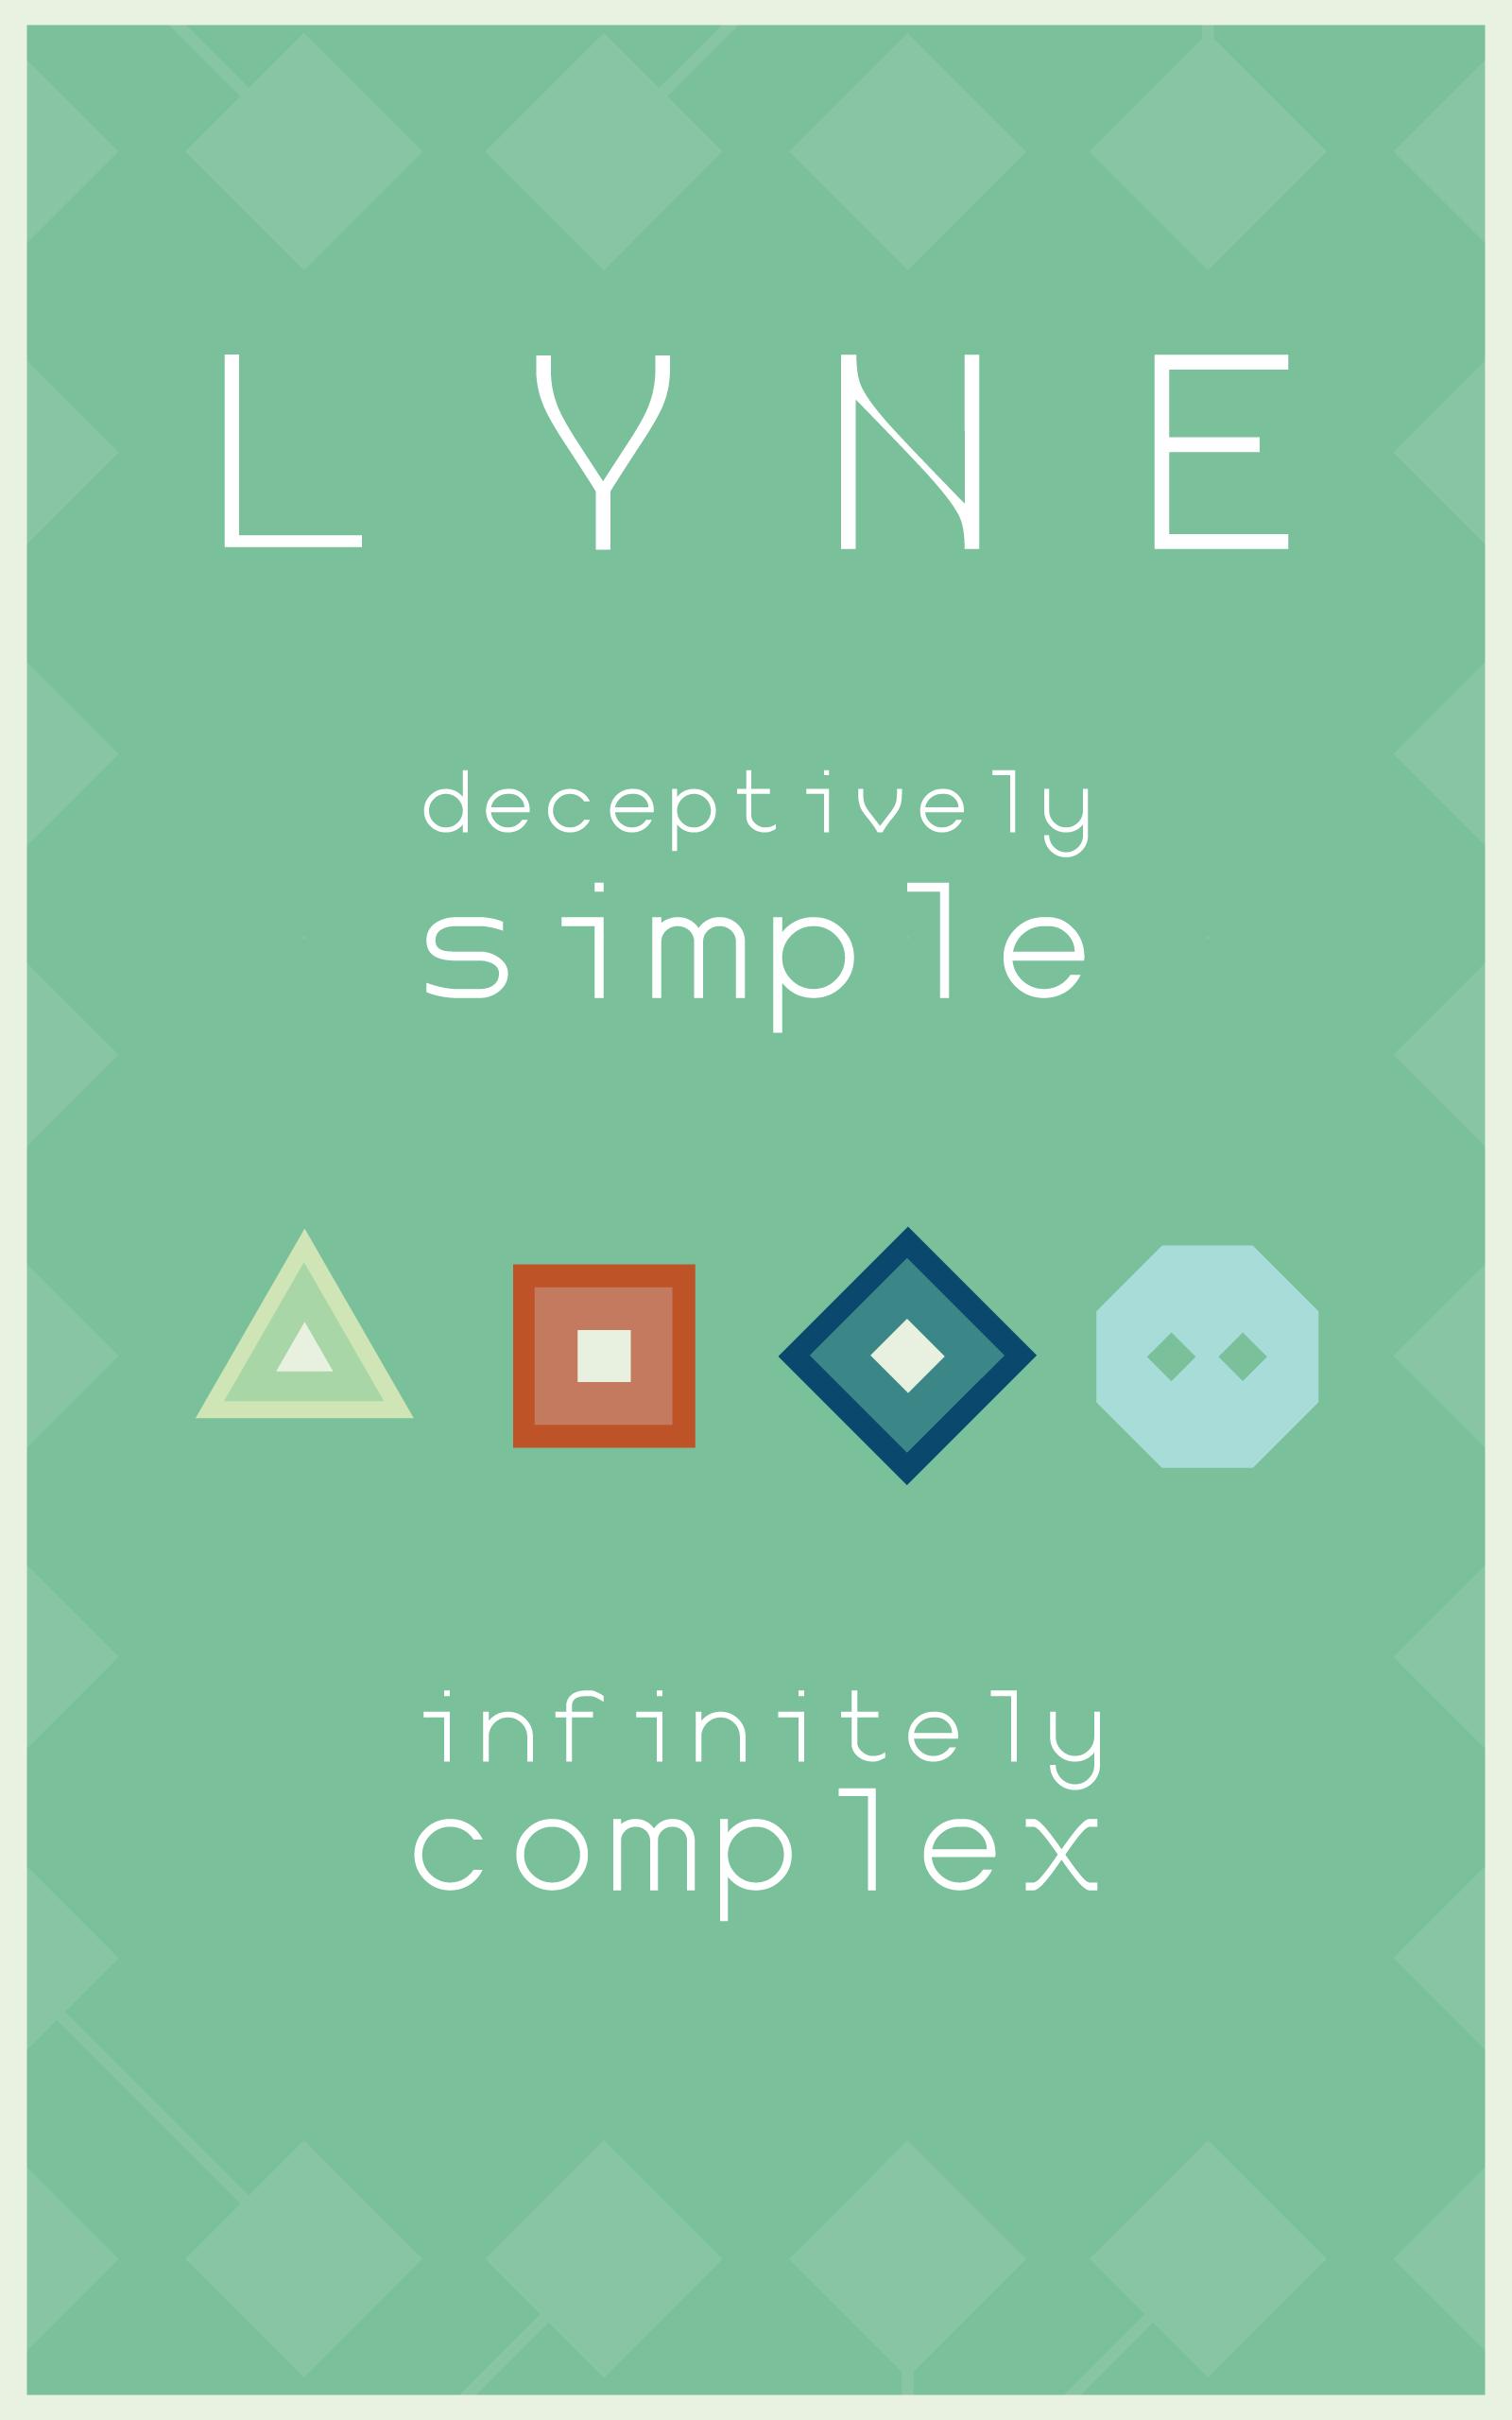 LYNE screenshot #7